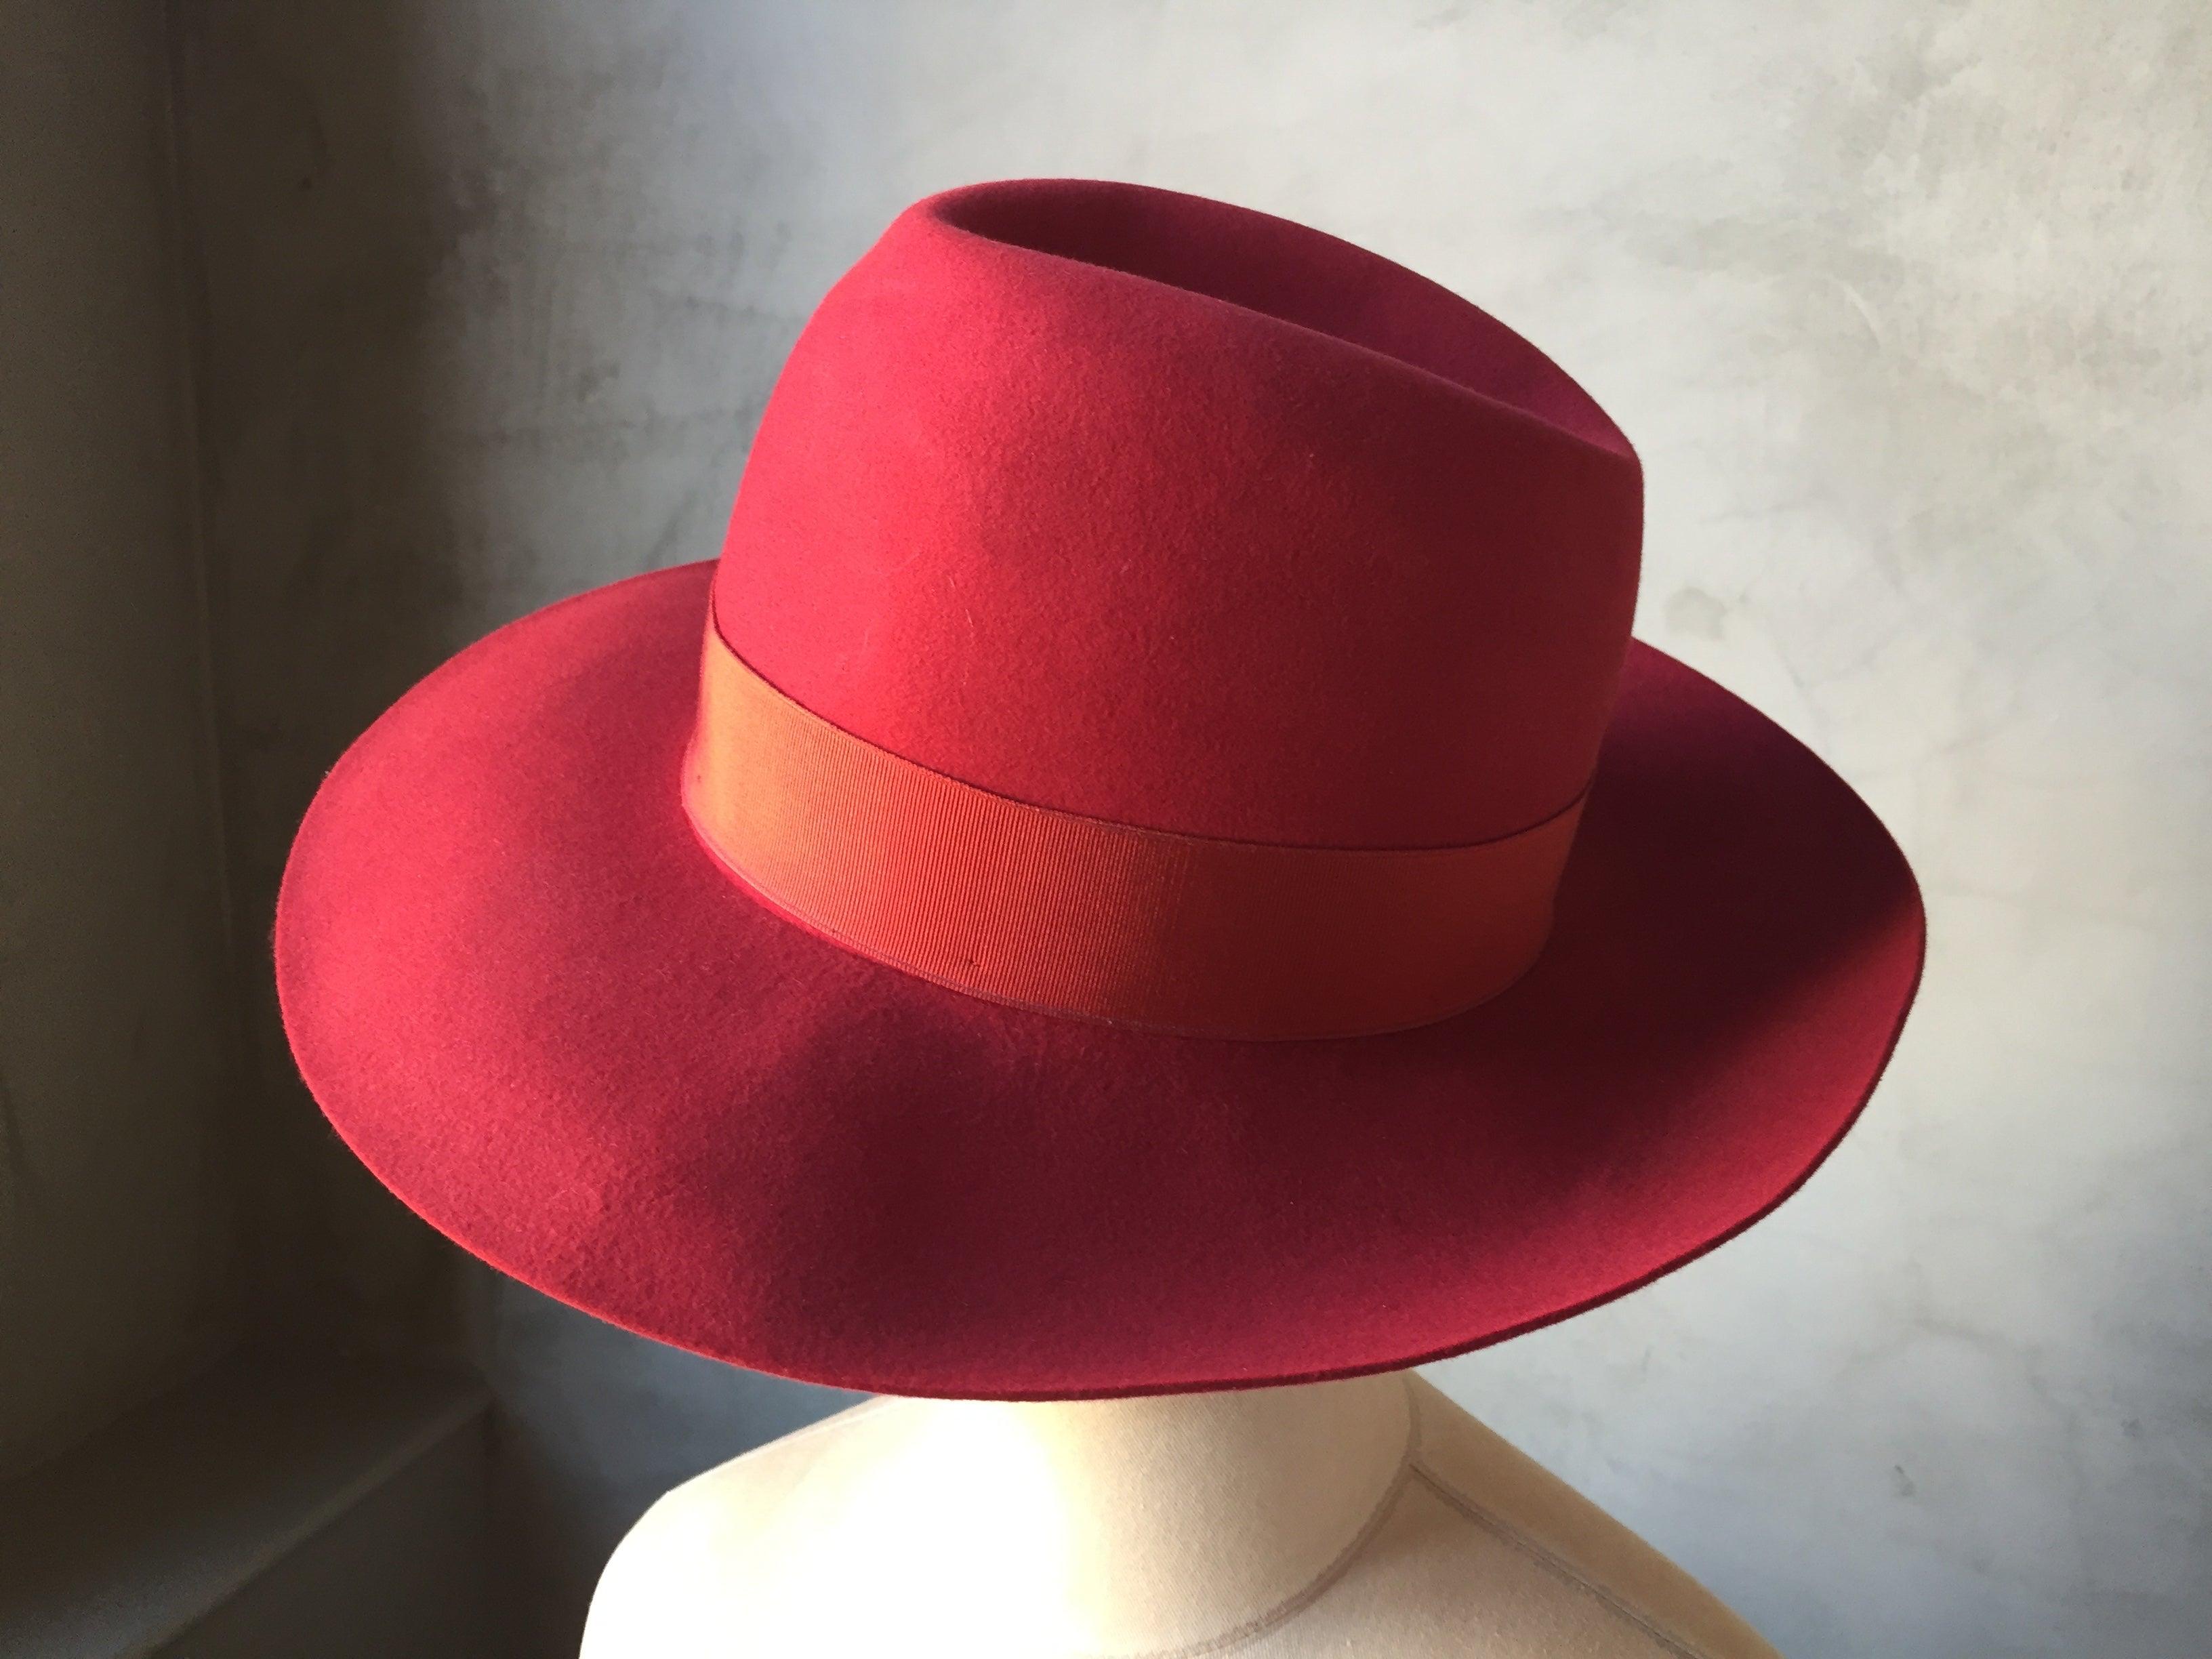 d5878d52cea8c5 Red Borsalino Alessandria Felt Fedora Hat at 1stdibs